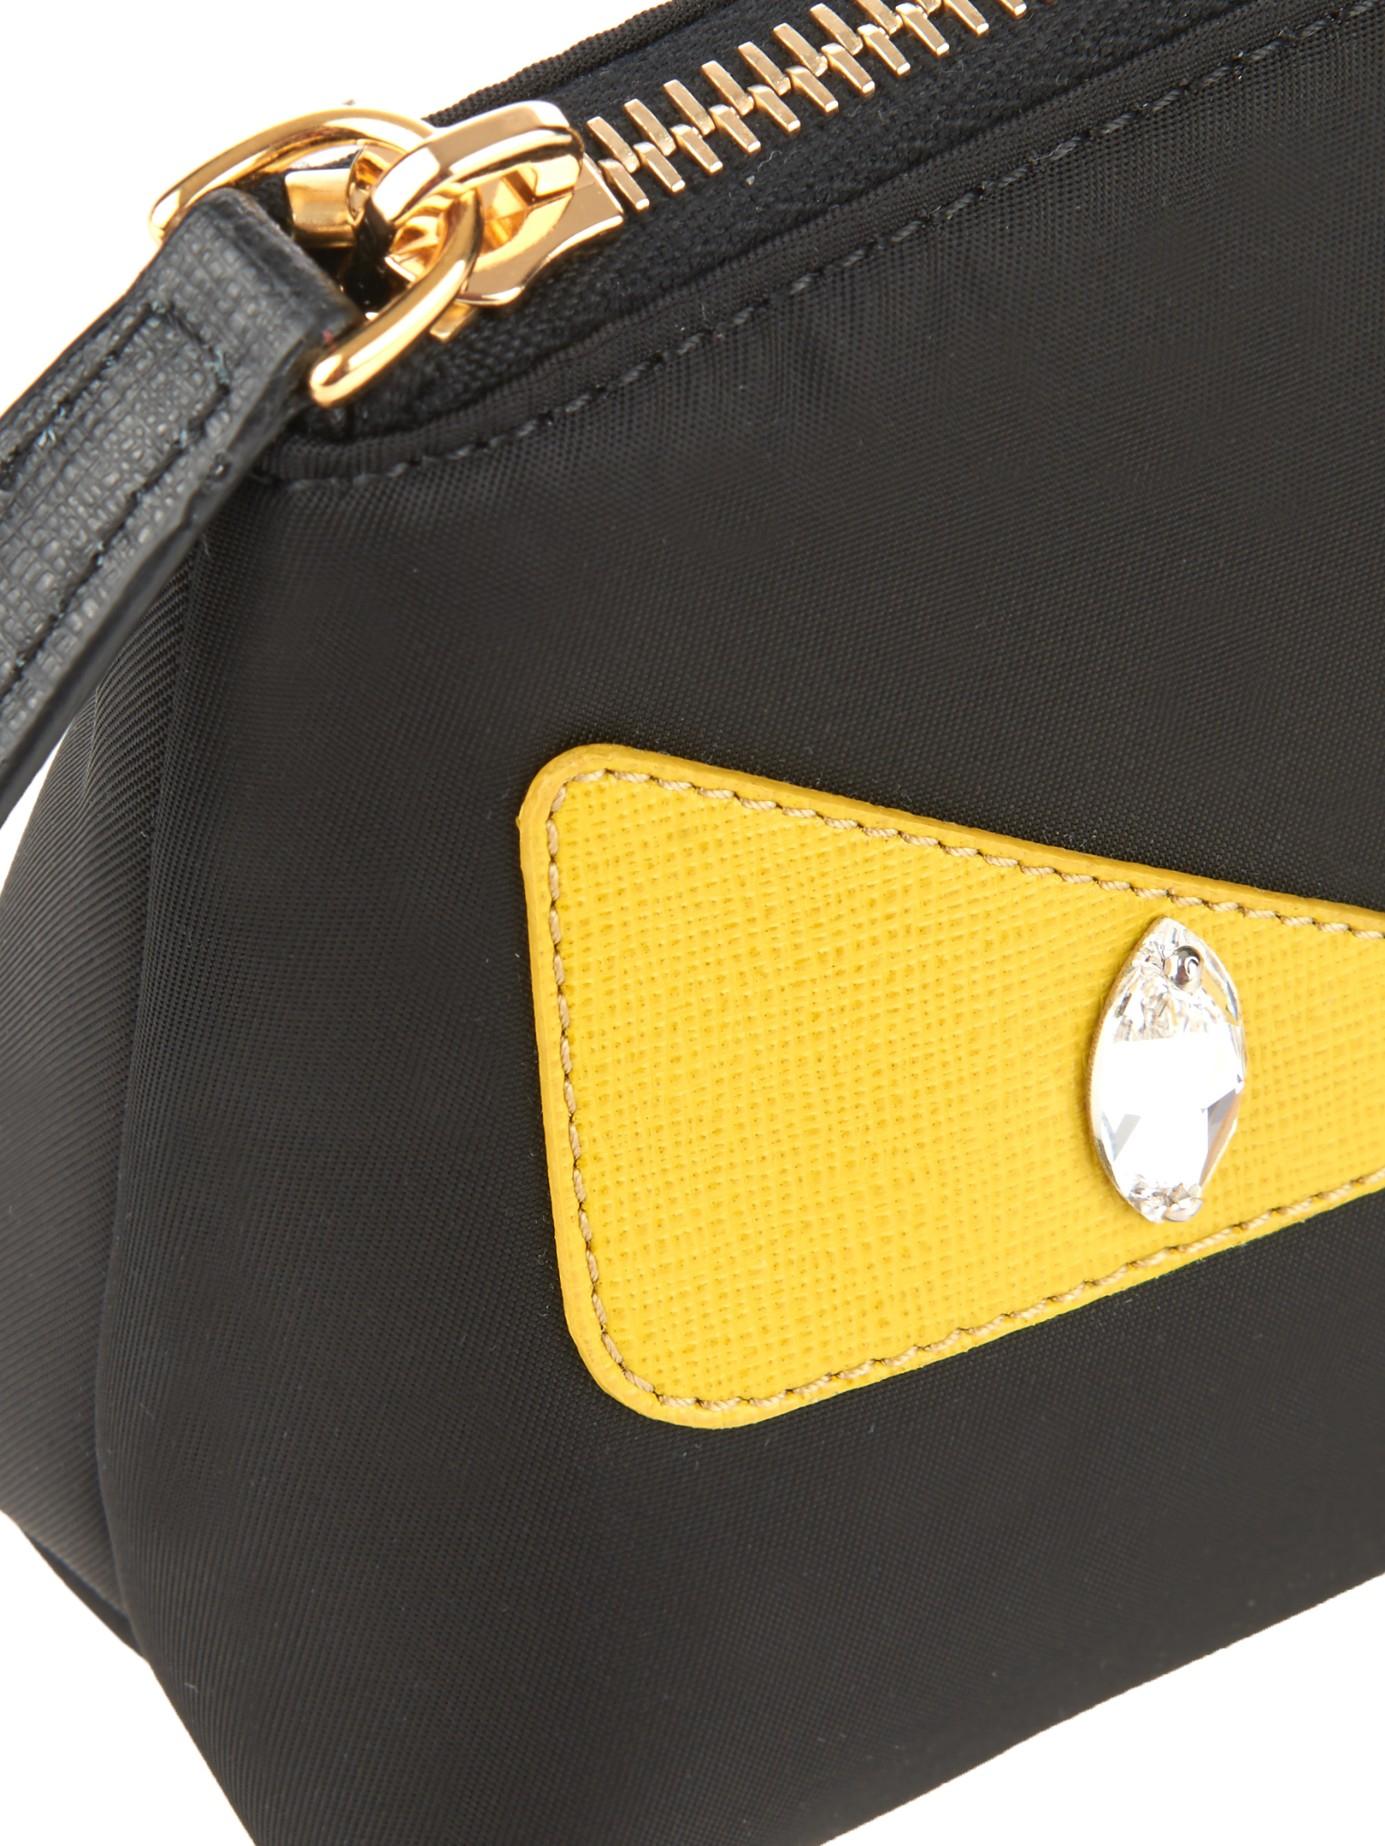 43b46954ae3e Lyst - Fendi Bag Bugs Cosmetics Case in Black